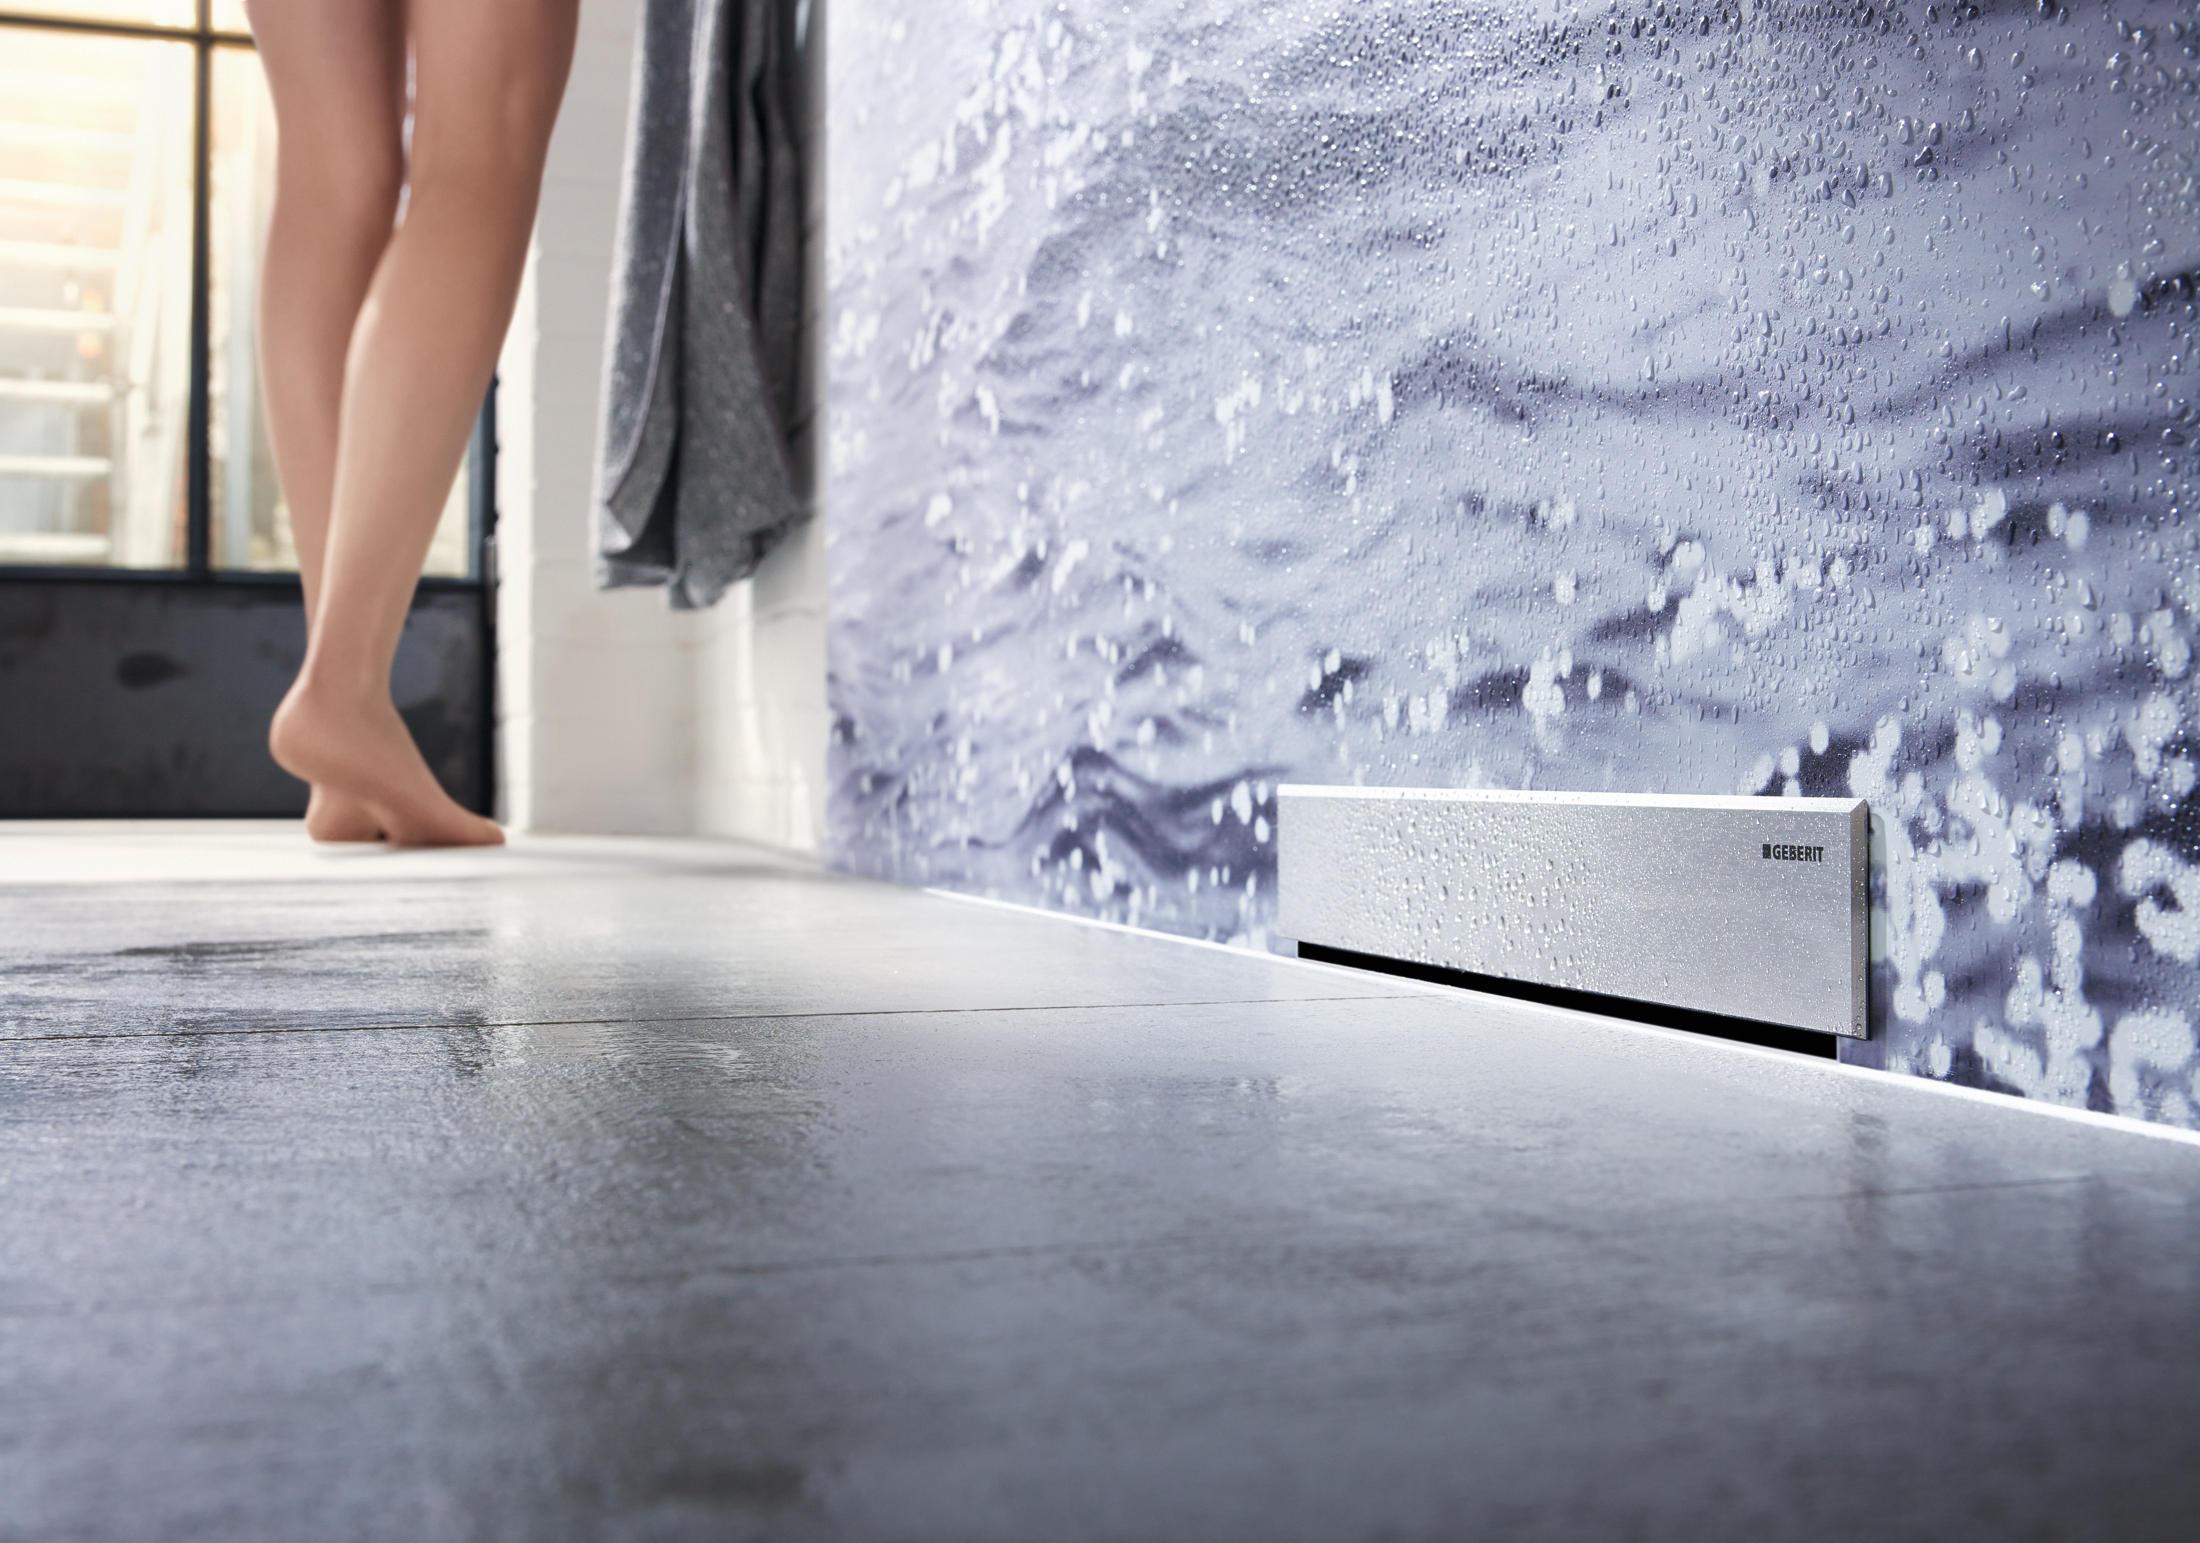 Geberit wall drain for showers scarichi doccia geberit architonic